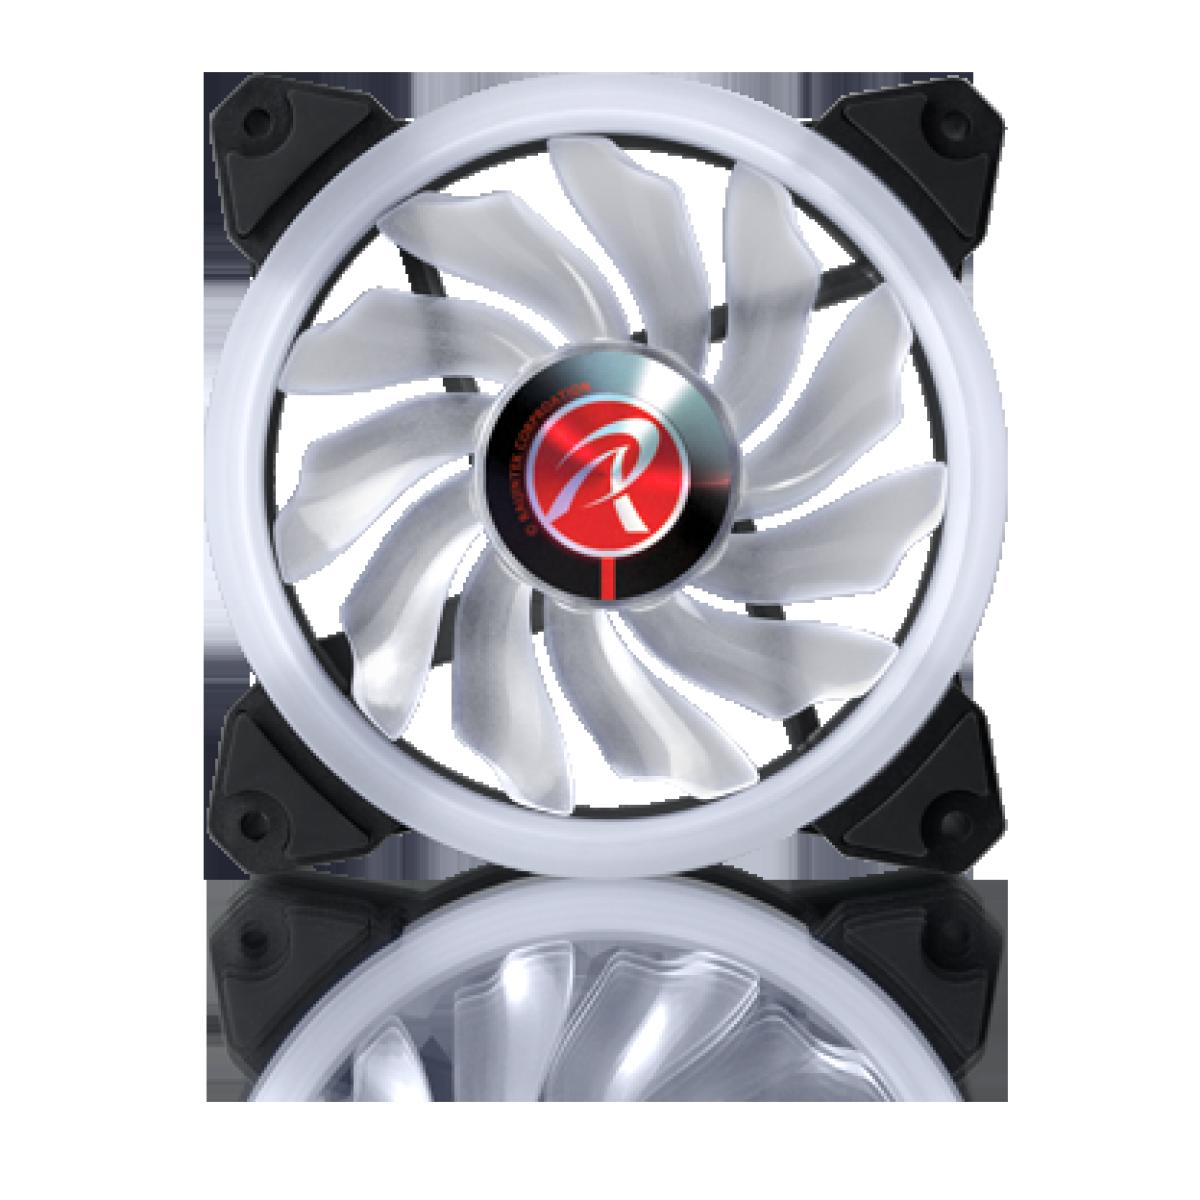 Cooler para Gabinete Raijintek Iris 12 RBW ADD, ARGB, 120mm, 0R40B00110